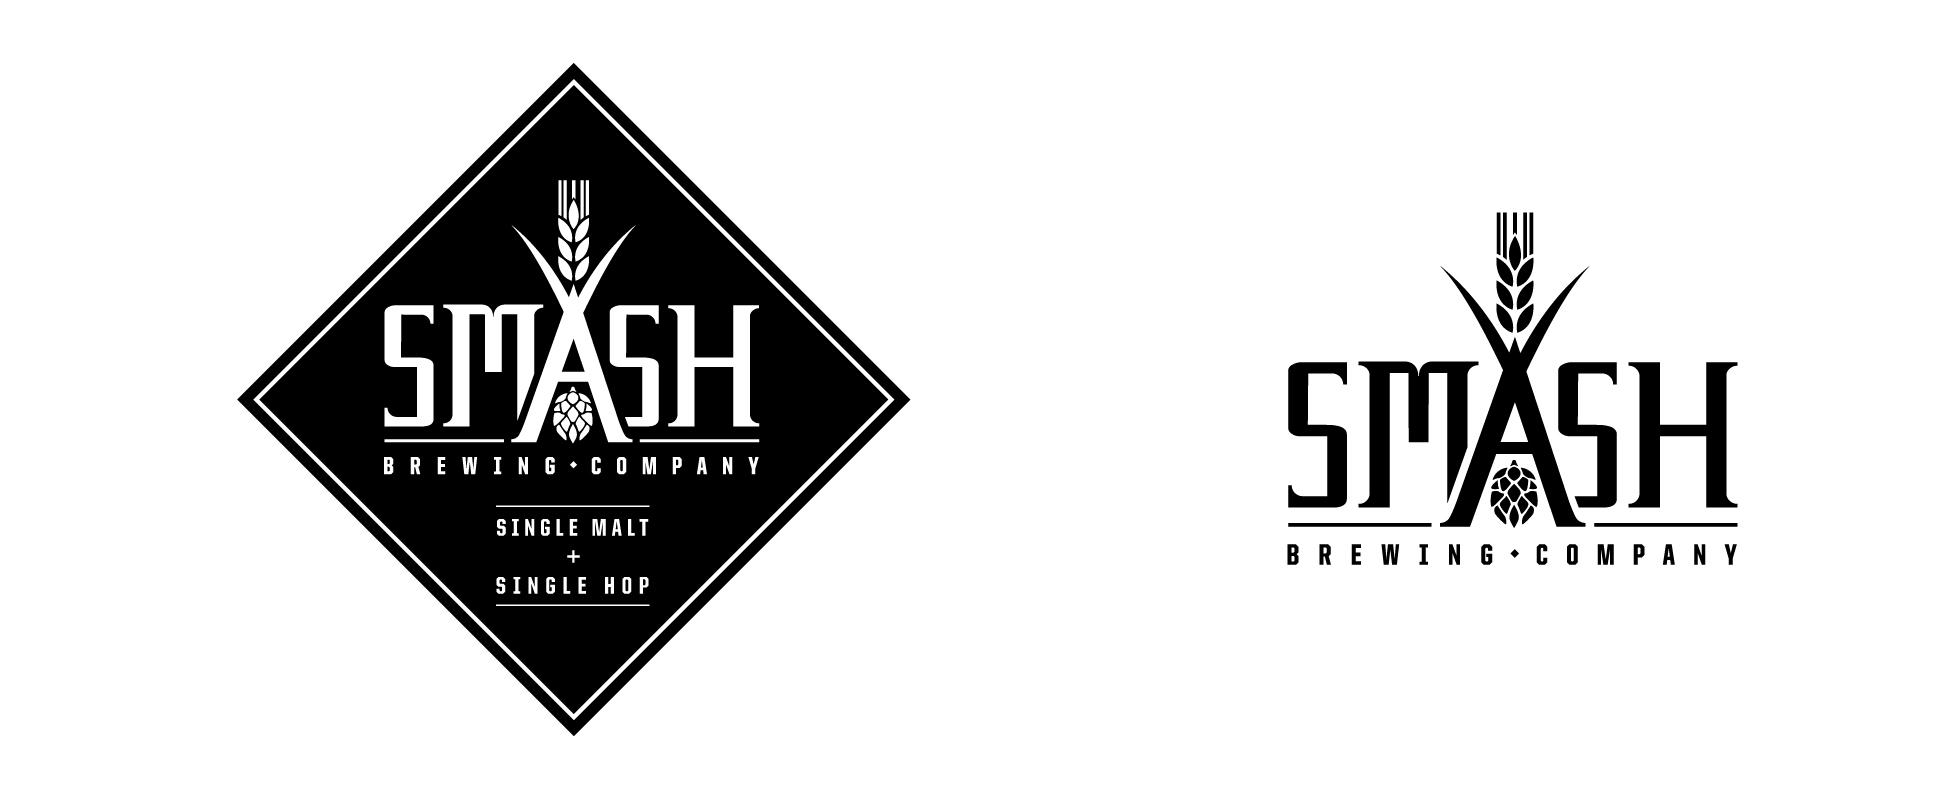 SMASH_brewing-01.jpg